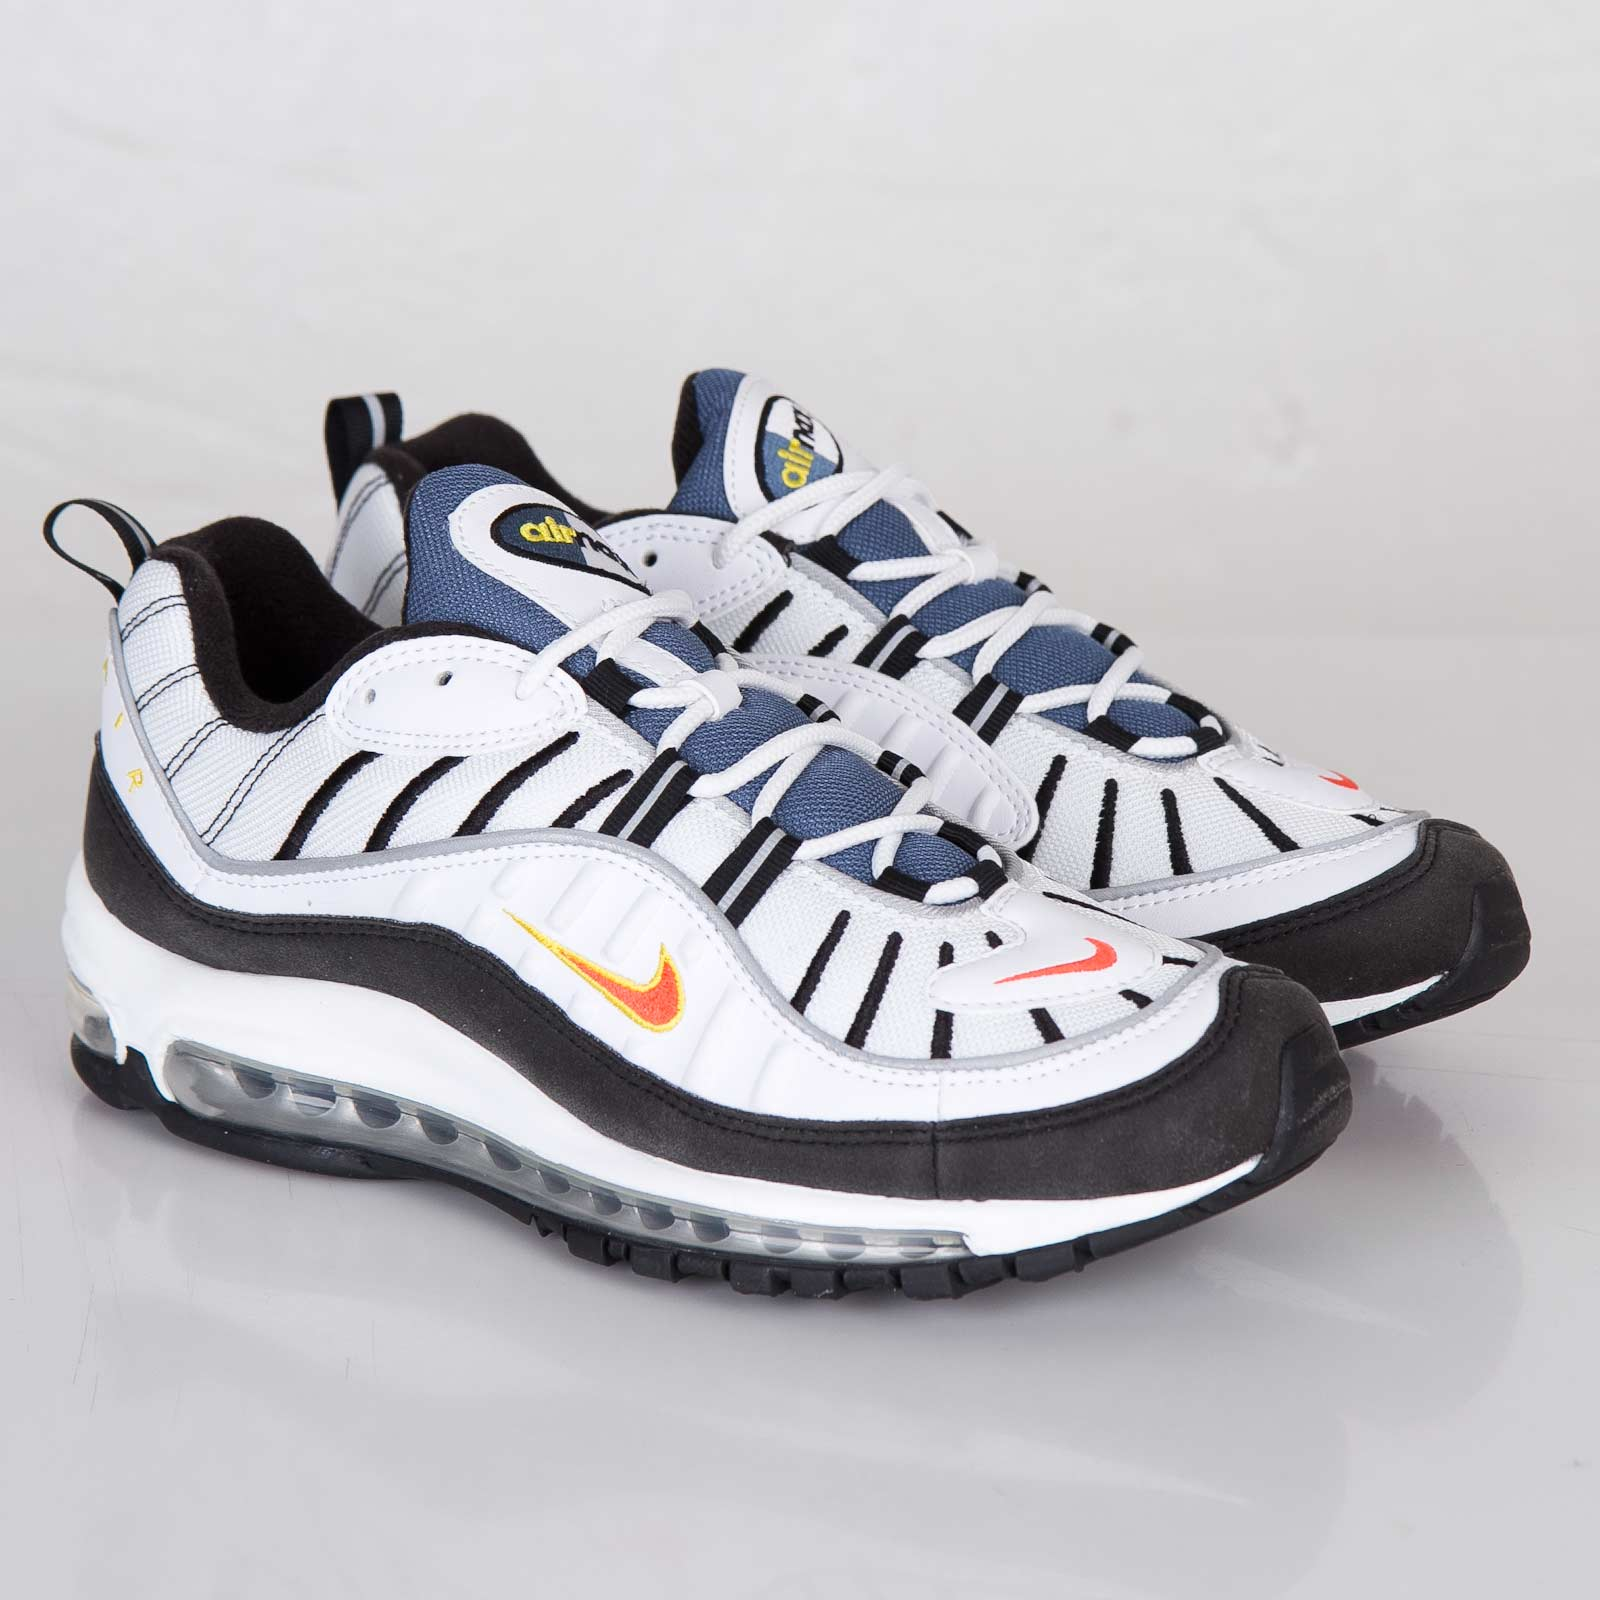 1465698ec03 Nike Air Max 98 - 640744-101 - Sneakersnstuff